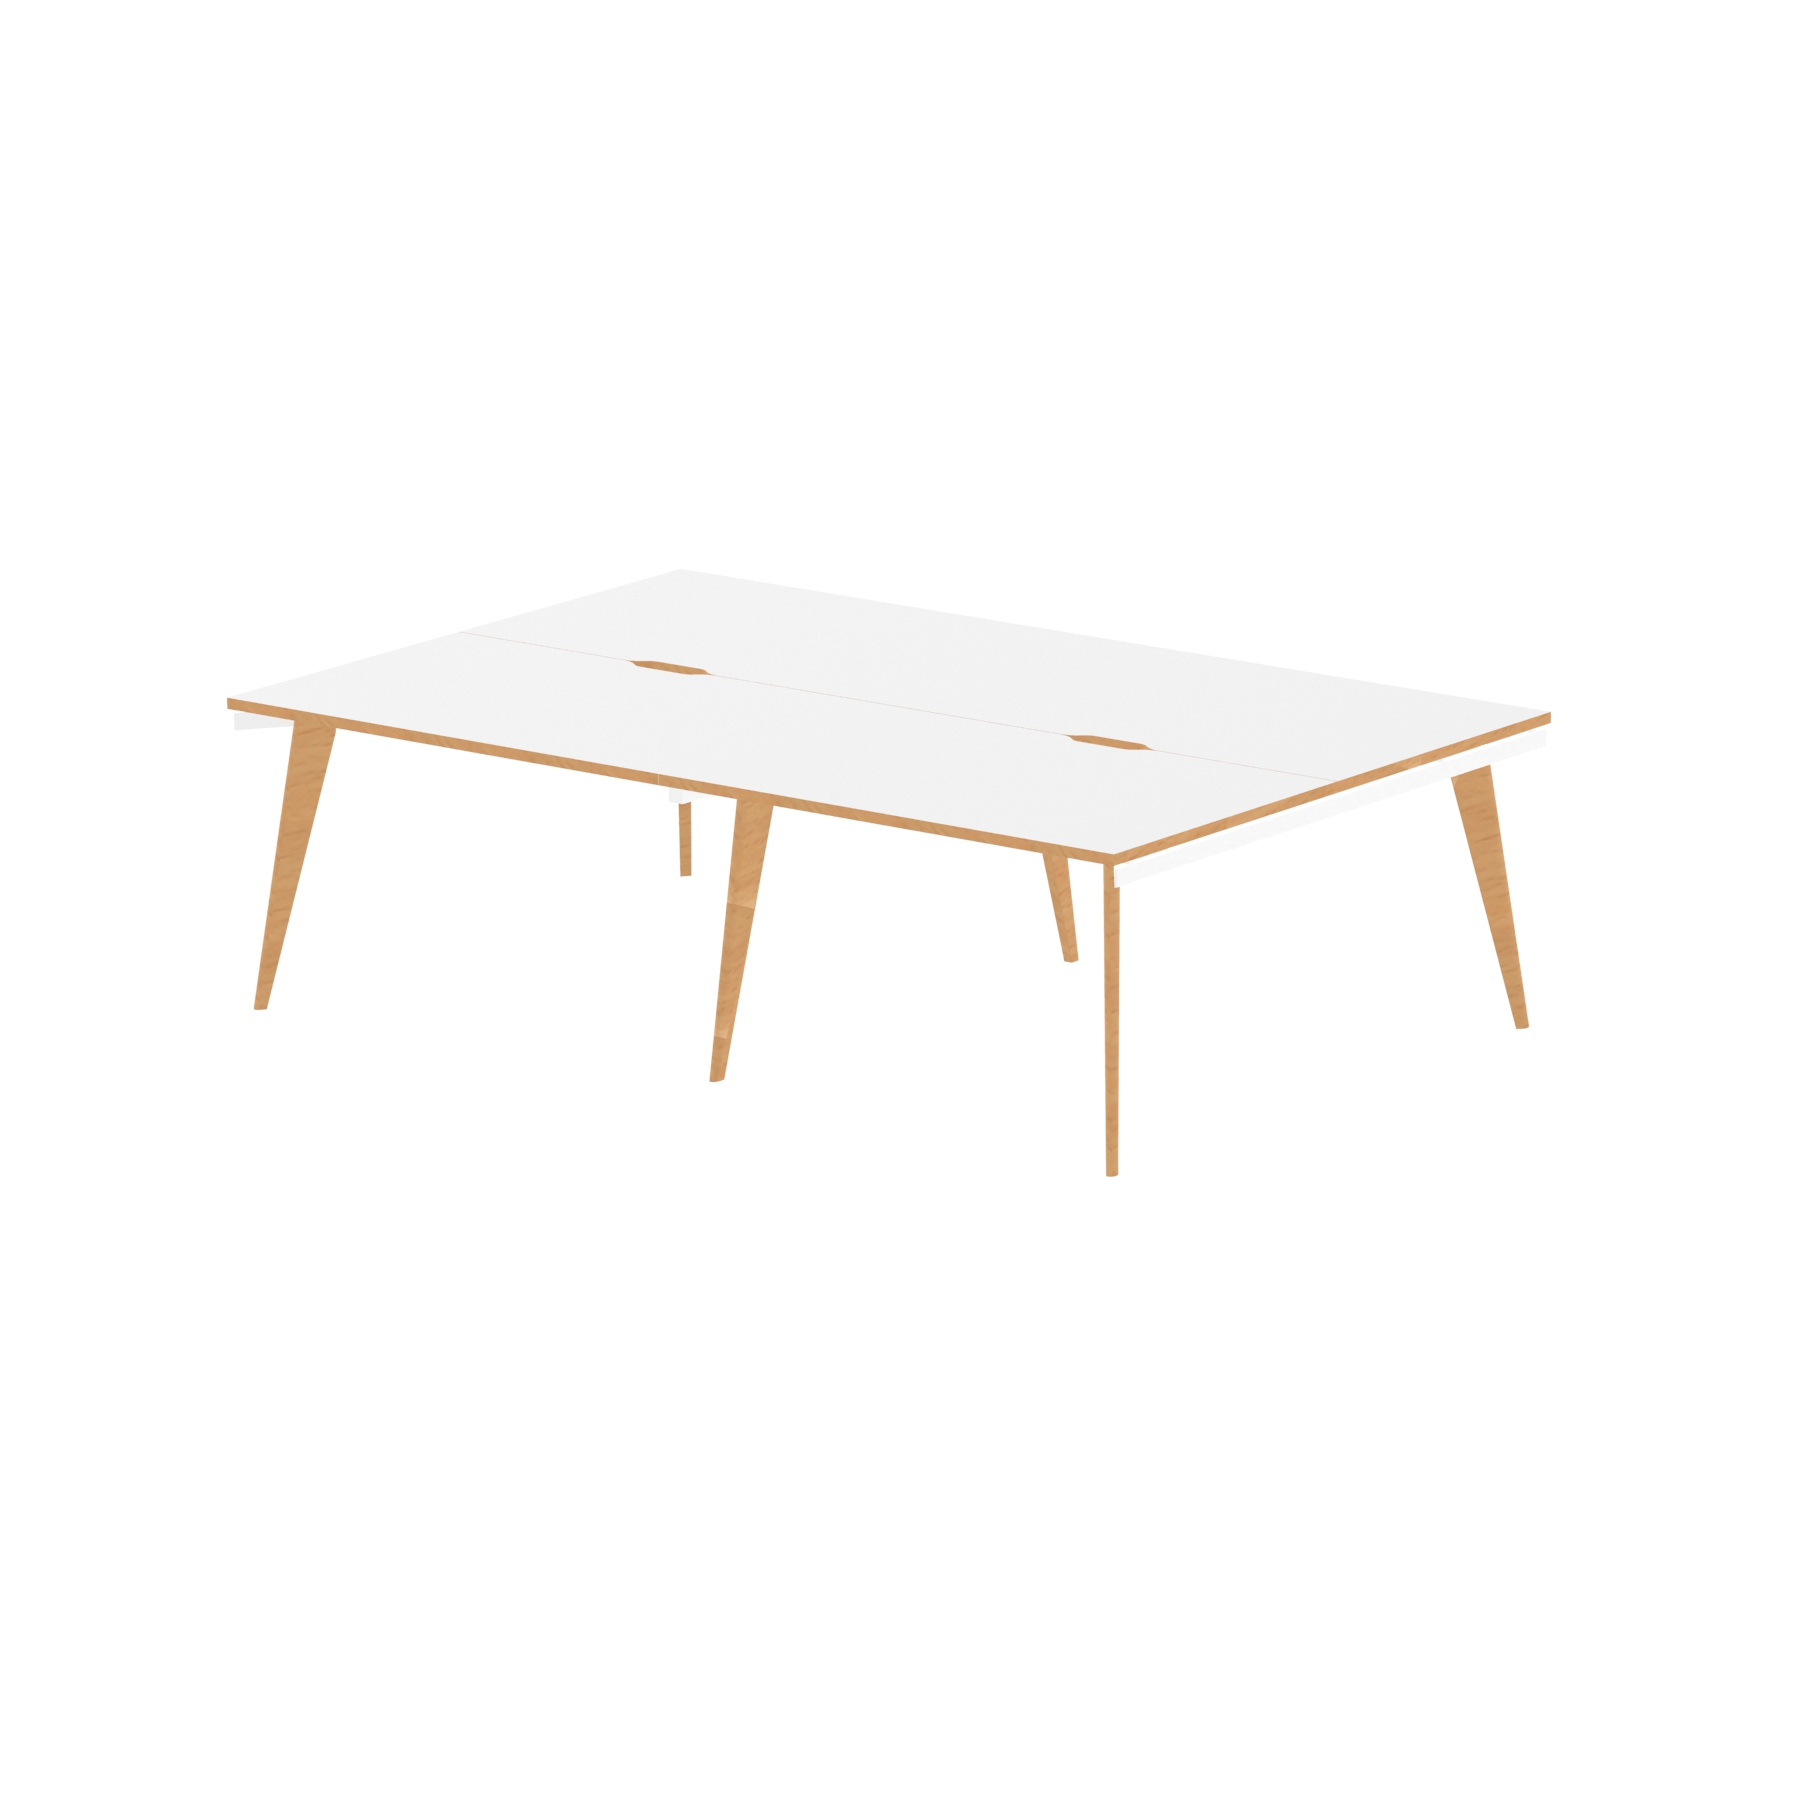 Oslo B2B White Frame Wooden Leg Bench Desk 1200 White With Natural Wood Edge (4 Pod)